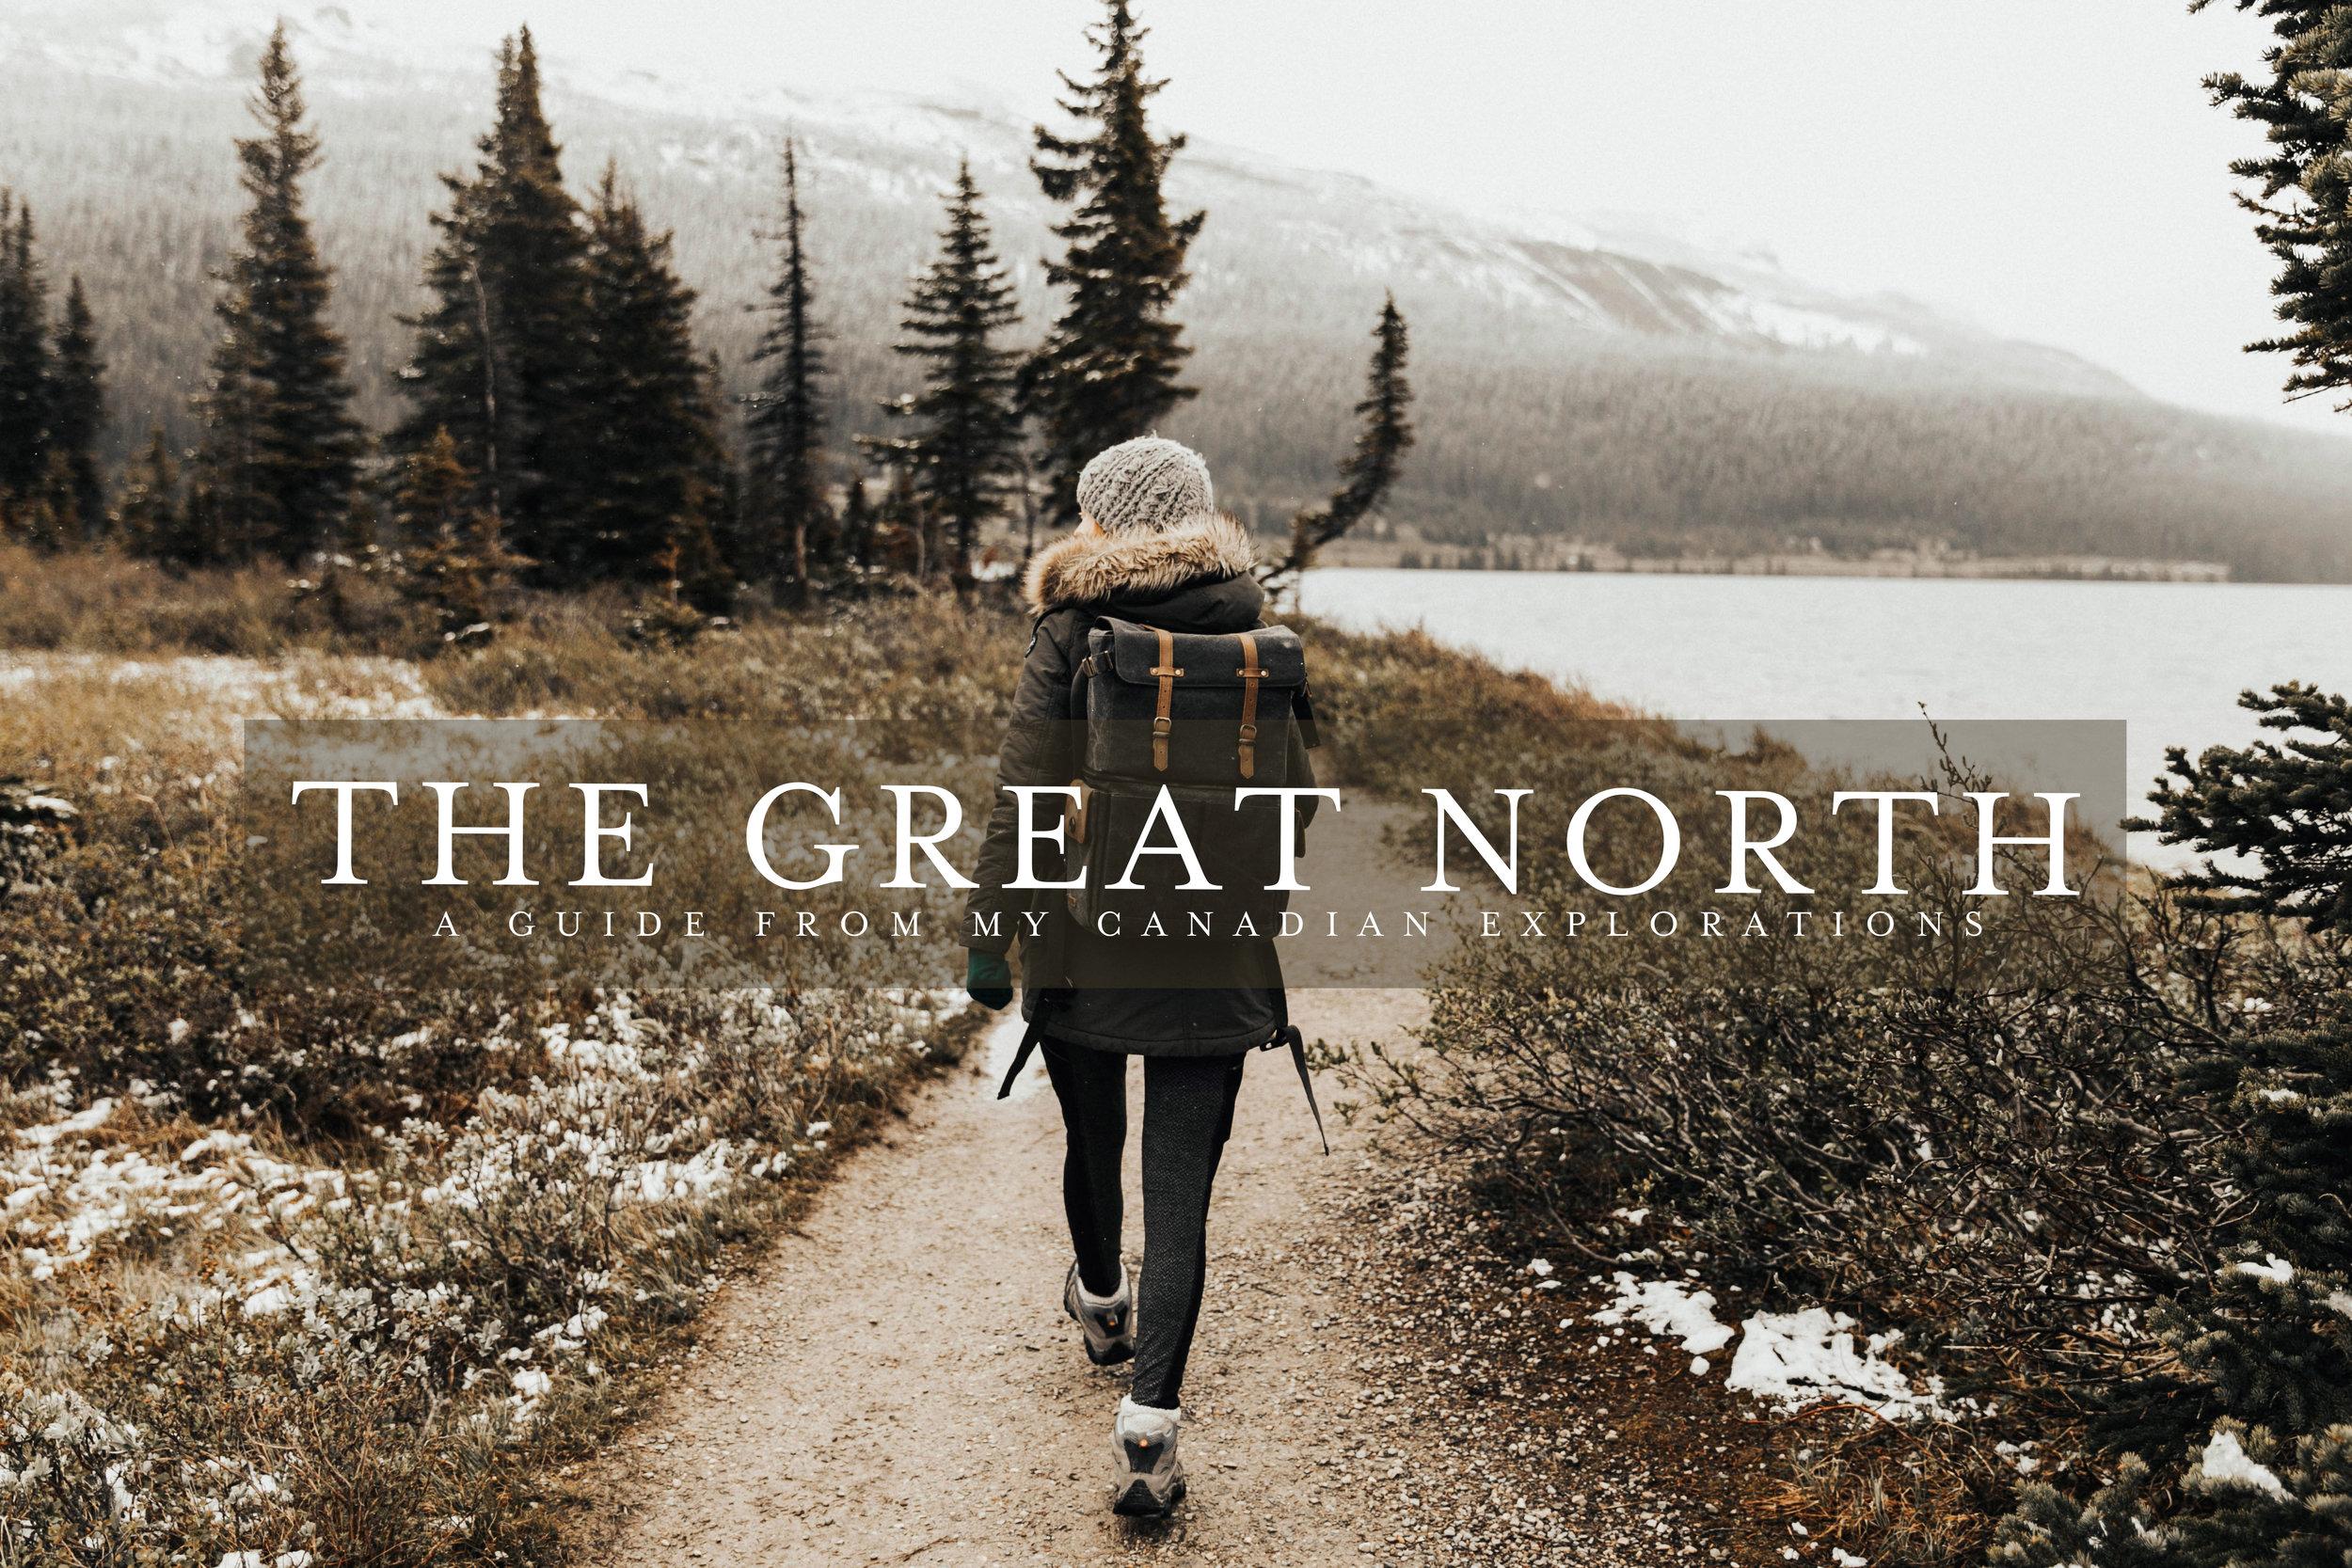 canada canadian travel guide explore british columbia banff jasper vancouver  alberta lake louise moraine